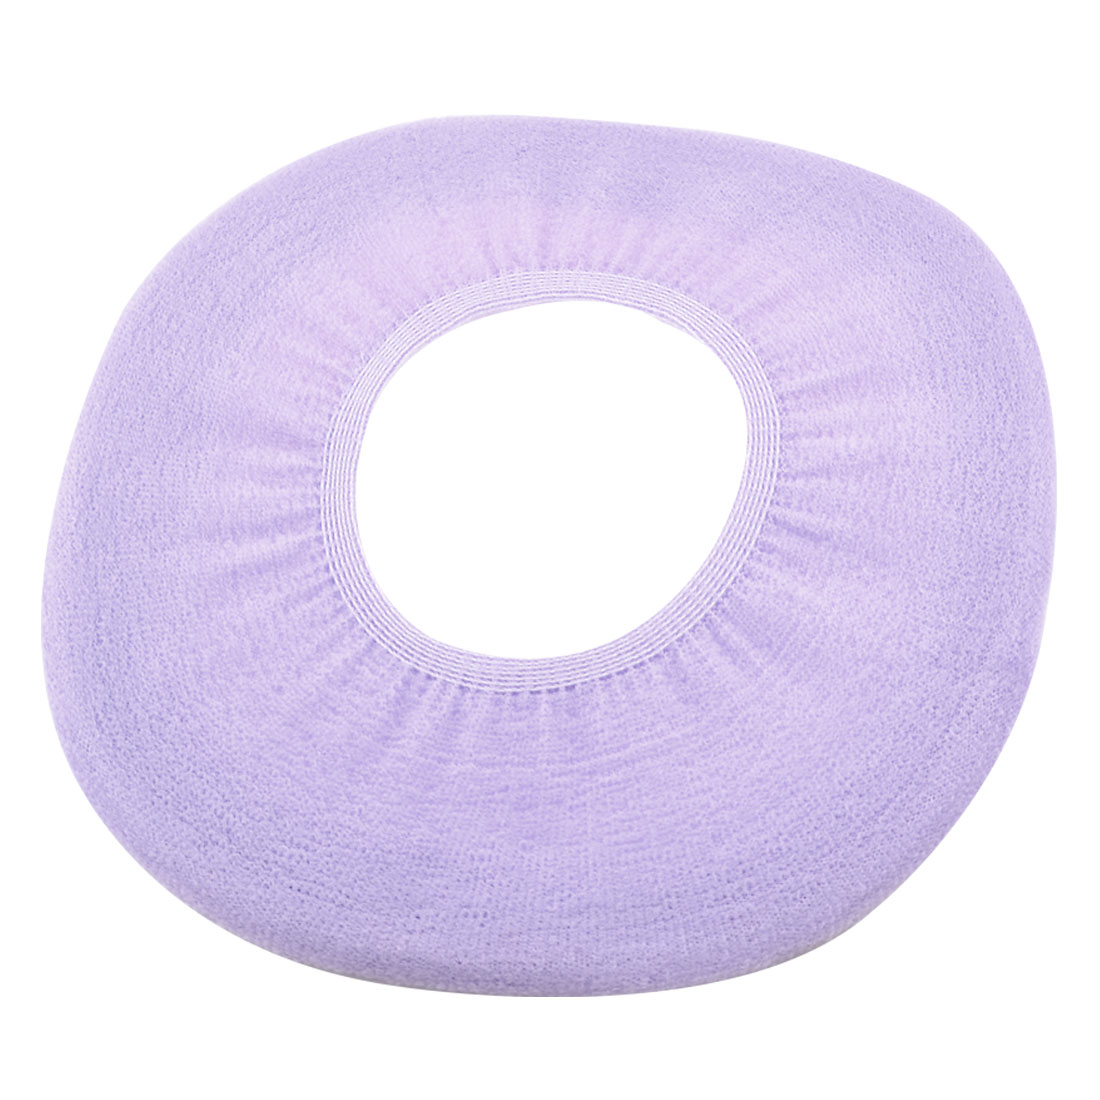 Bathroom Pure Light Purple Stretch Fleece Warmer Toilet Seat Cushion Pad